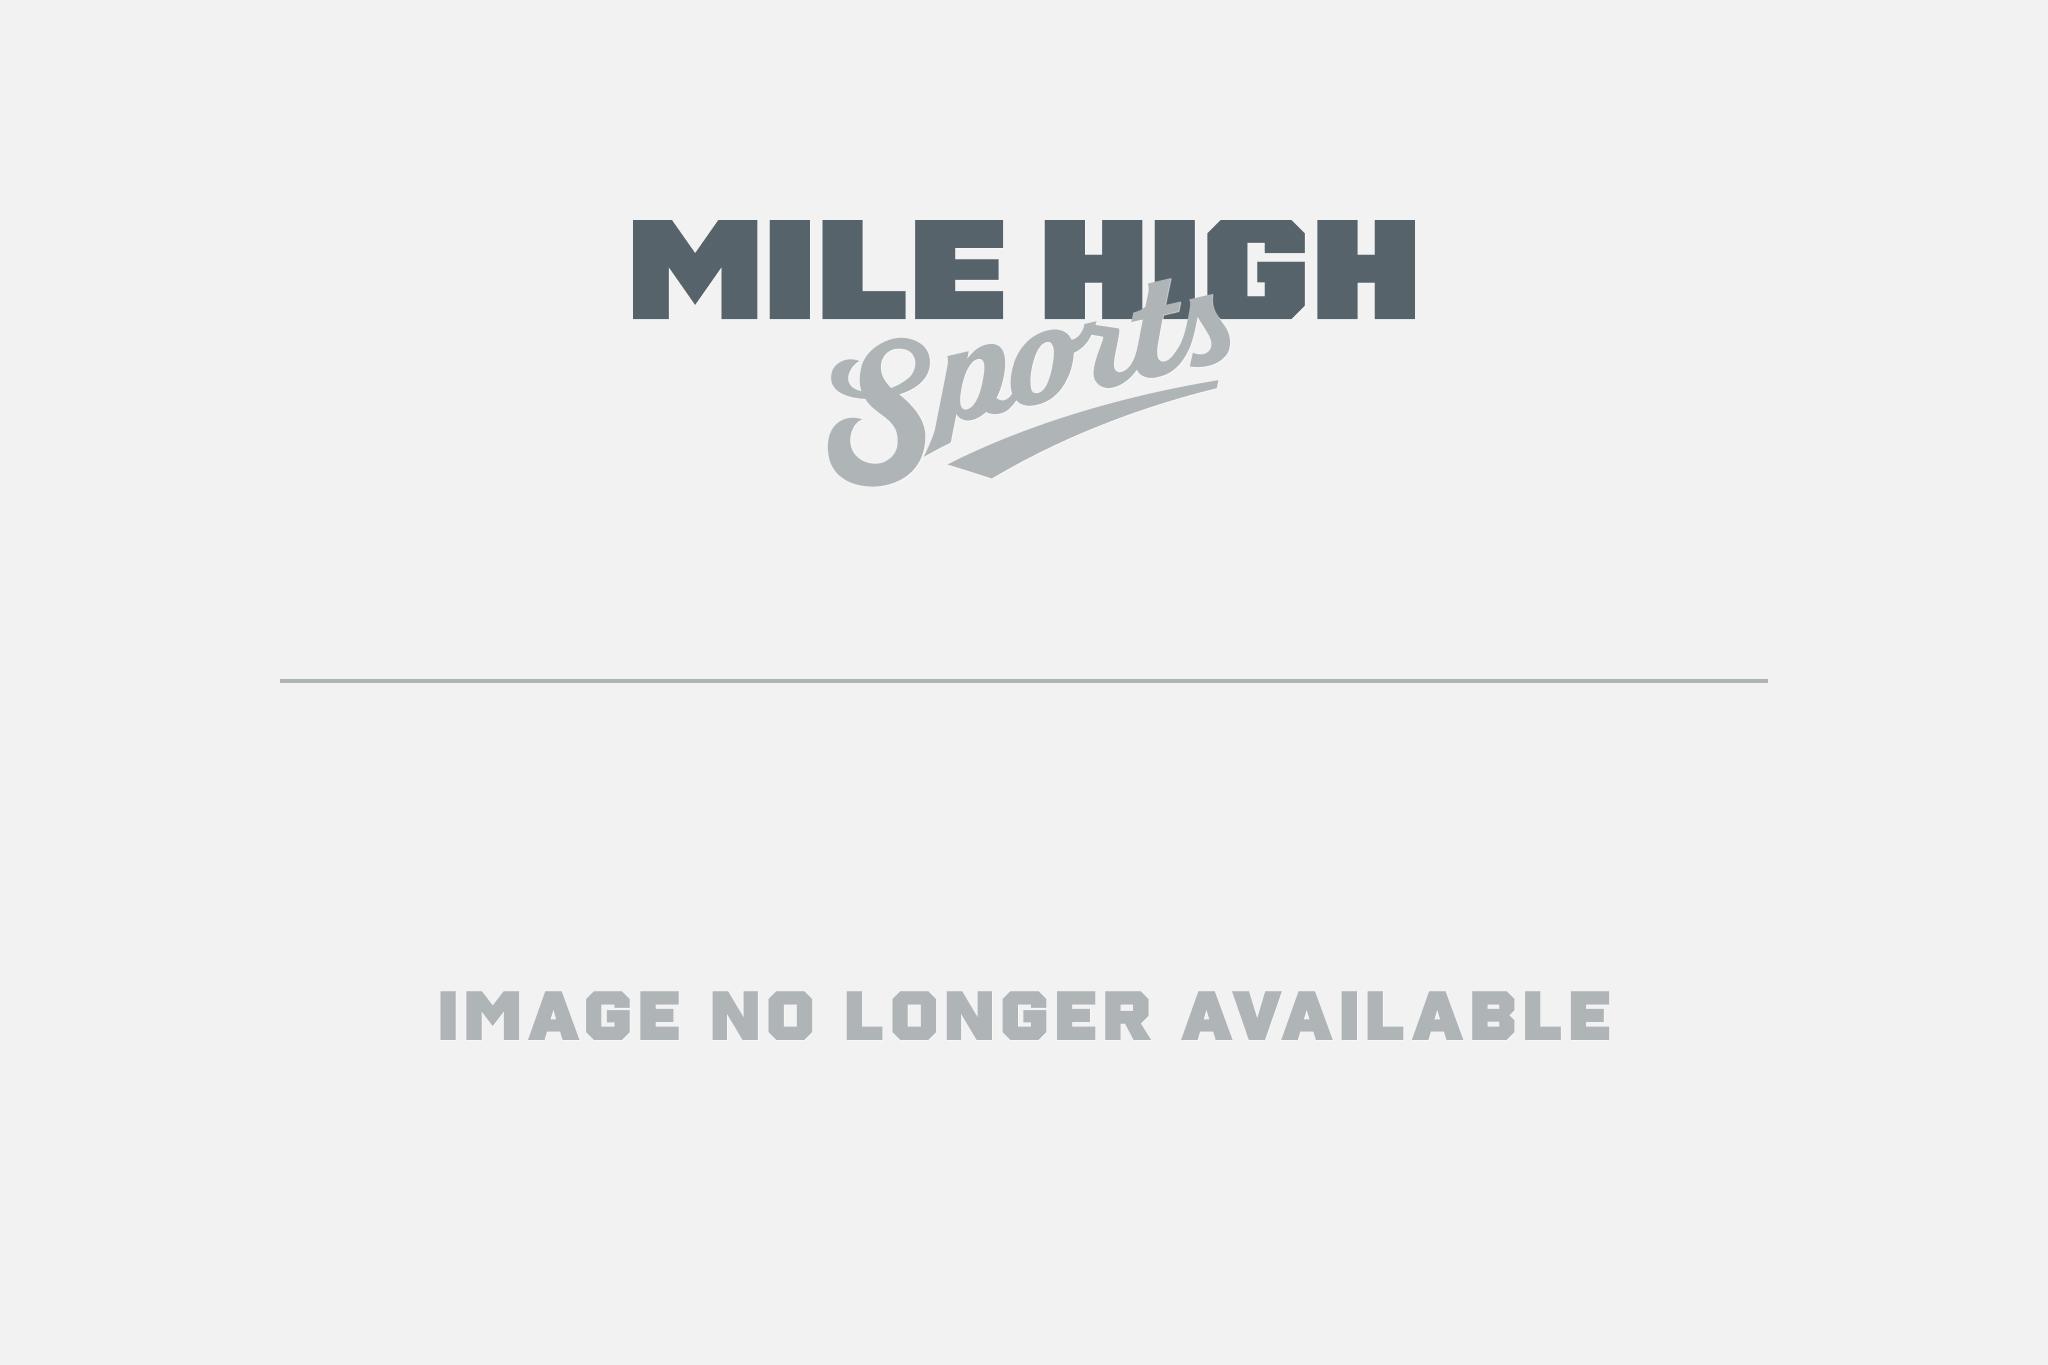 chsaa_logo cropped